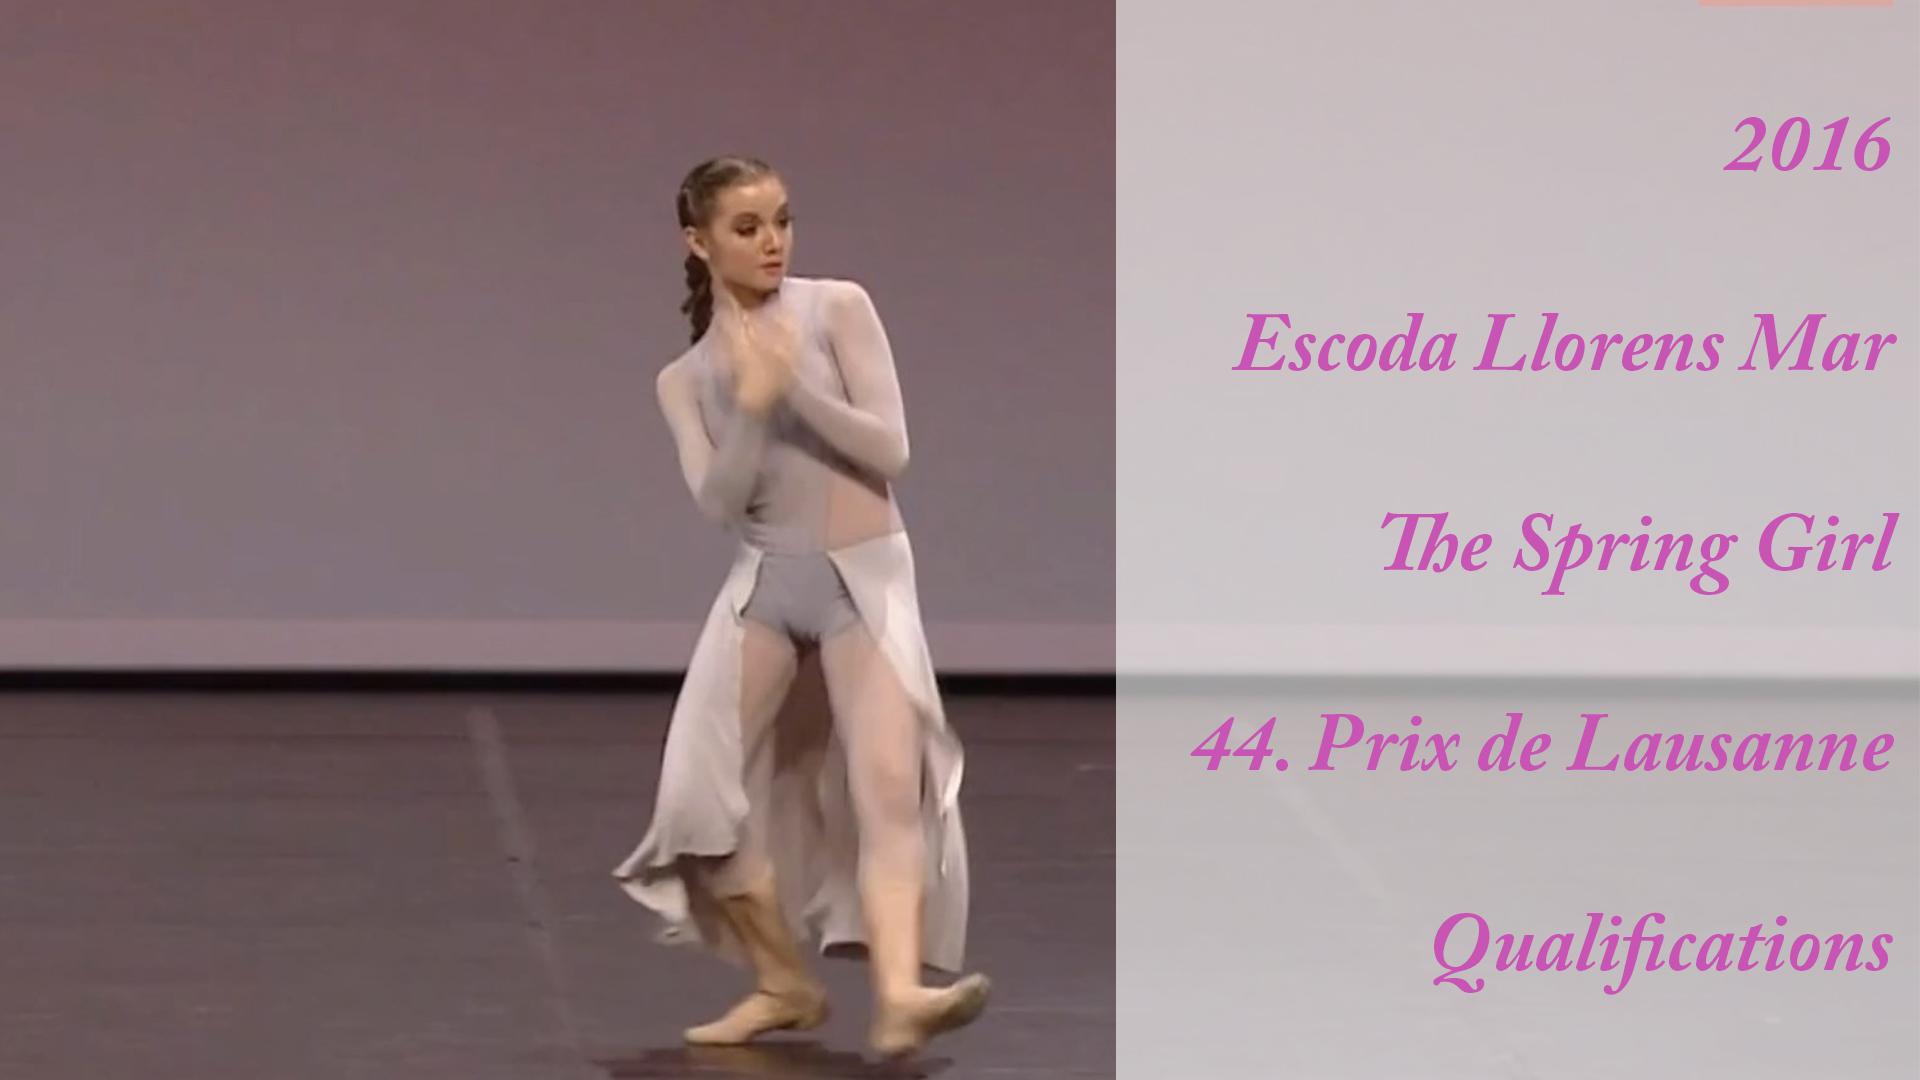 2016 – Escoda Llorens Mar – The Spring Girl – 44. Prix de Lausanne – Qualifications